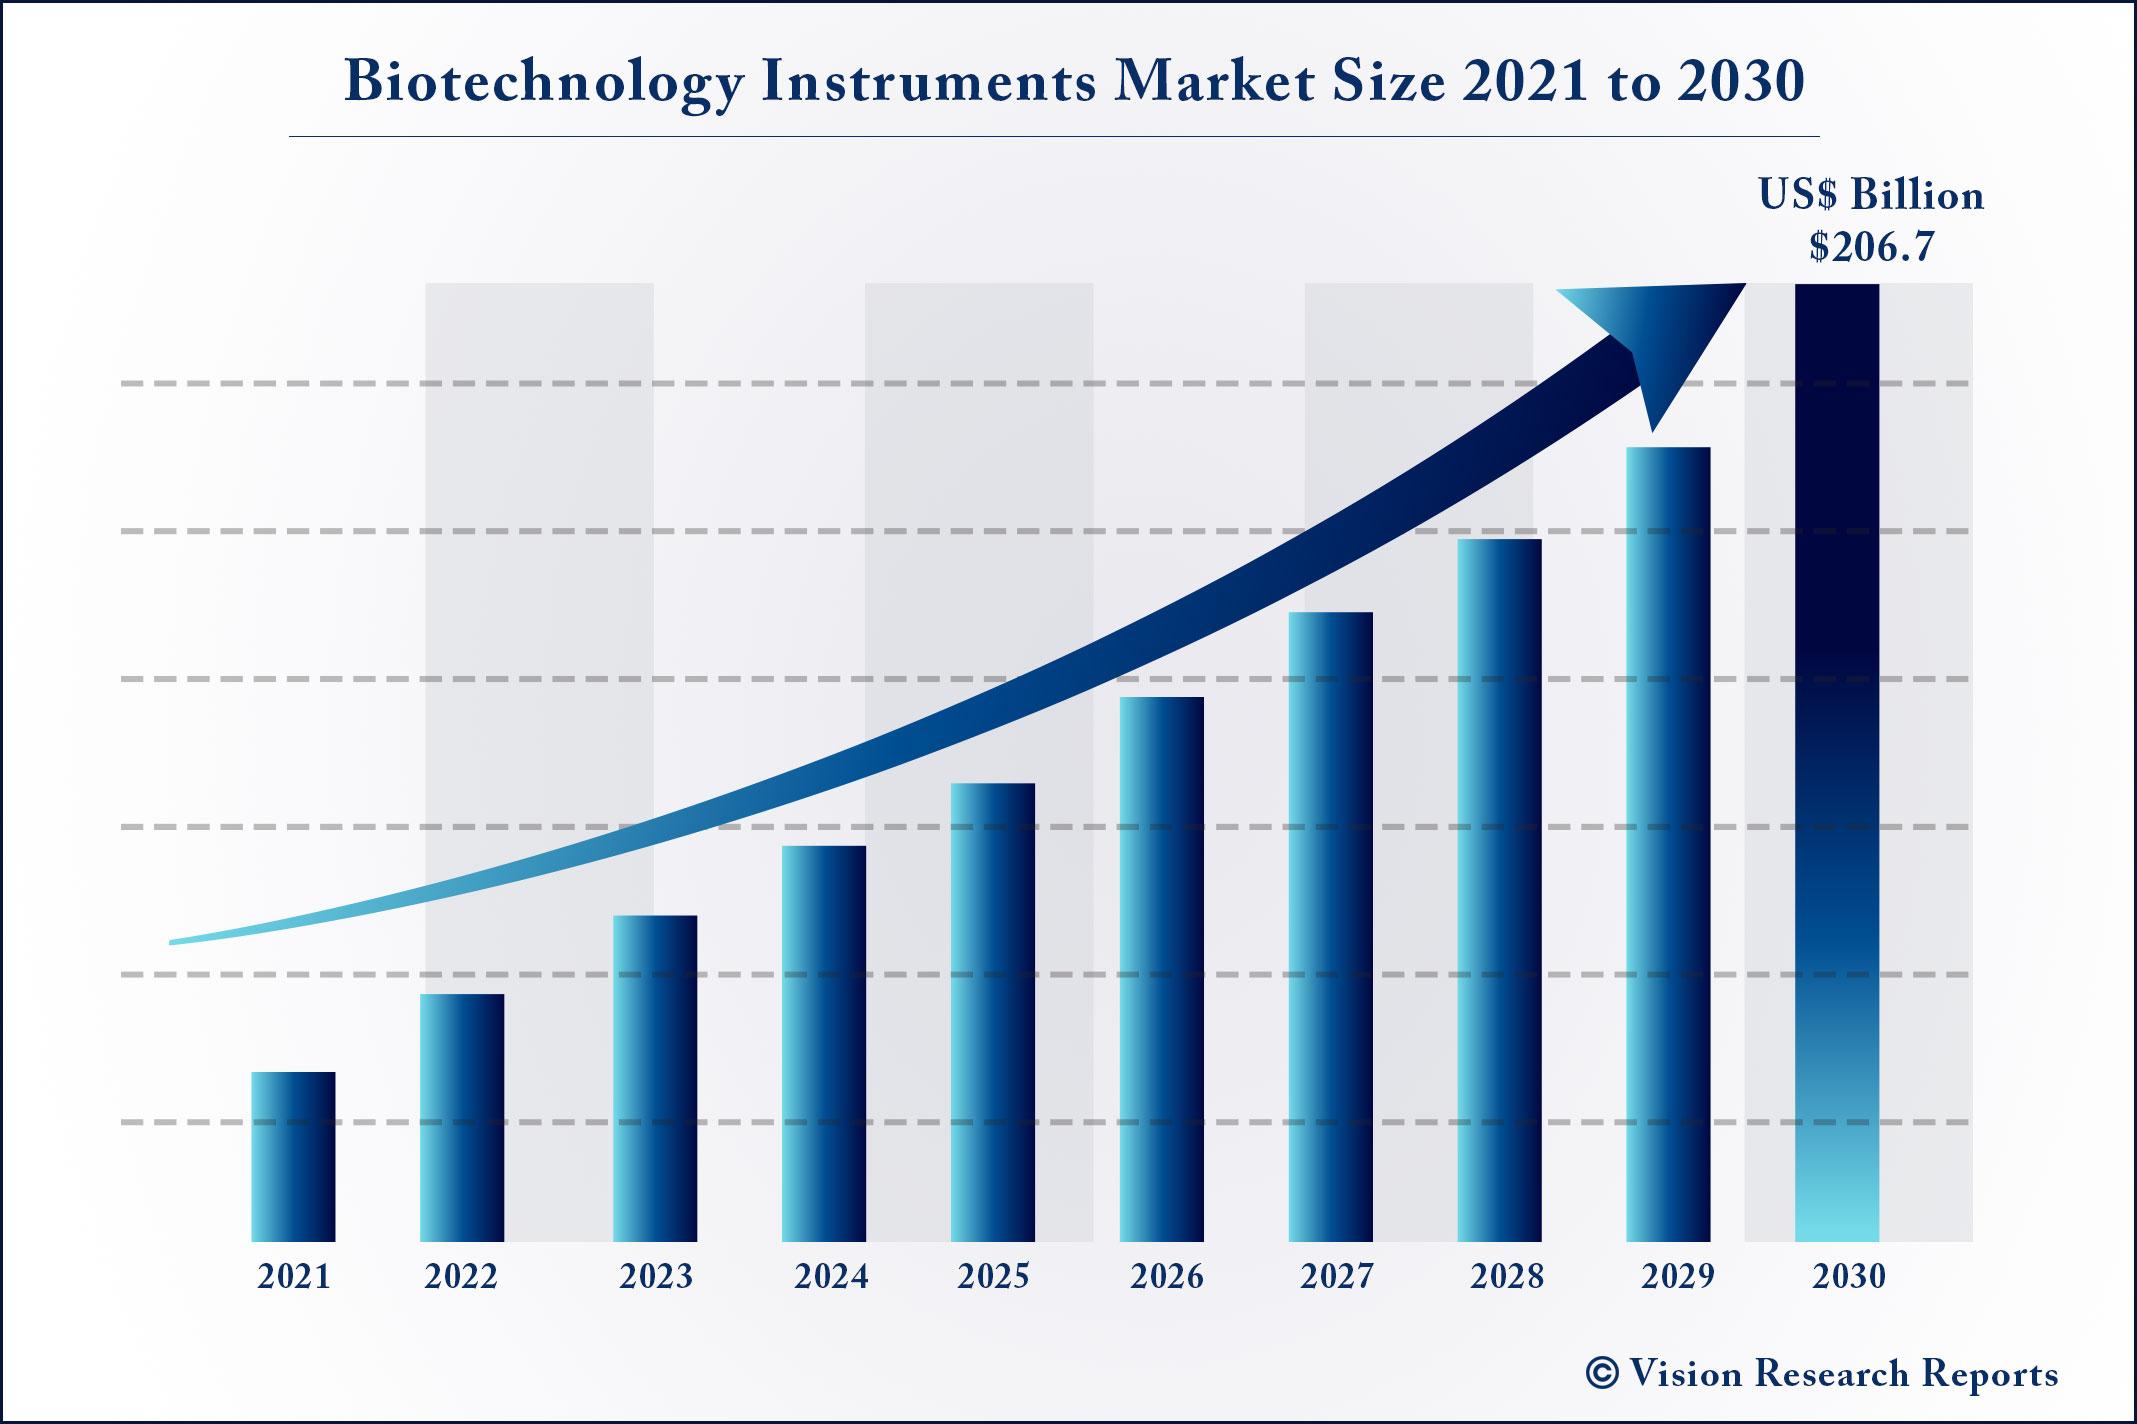 Biotechnology Instruments Market Size 2021 to 2030